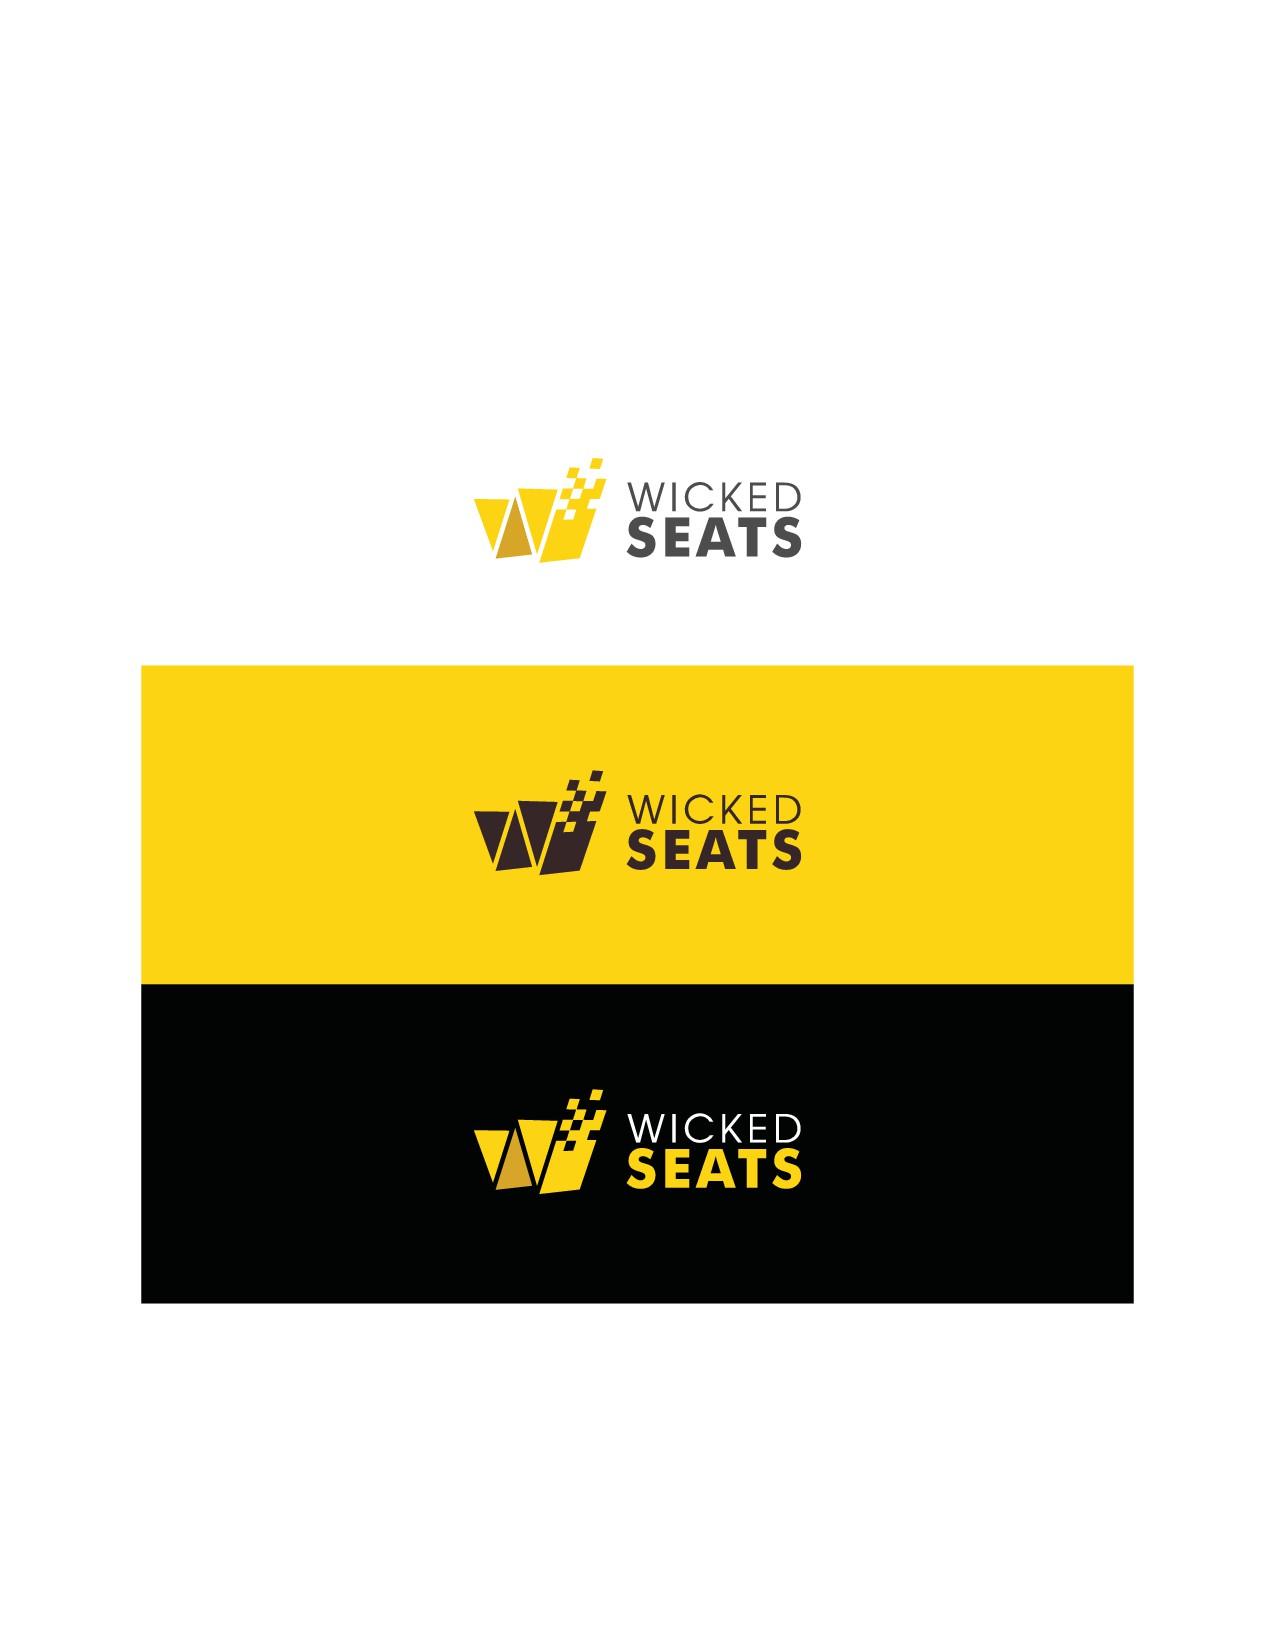 Design a modern logo for a ticket marketplace